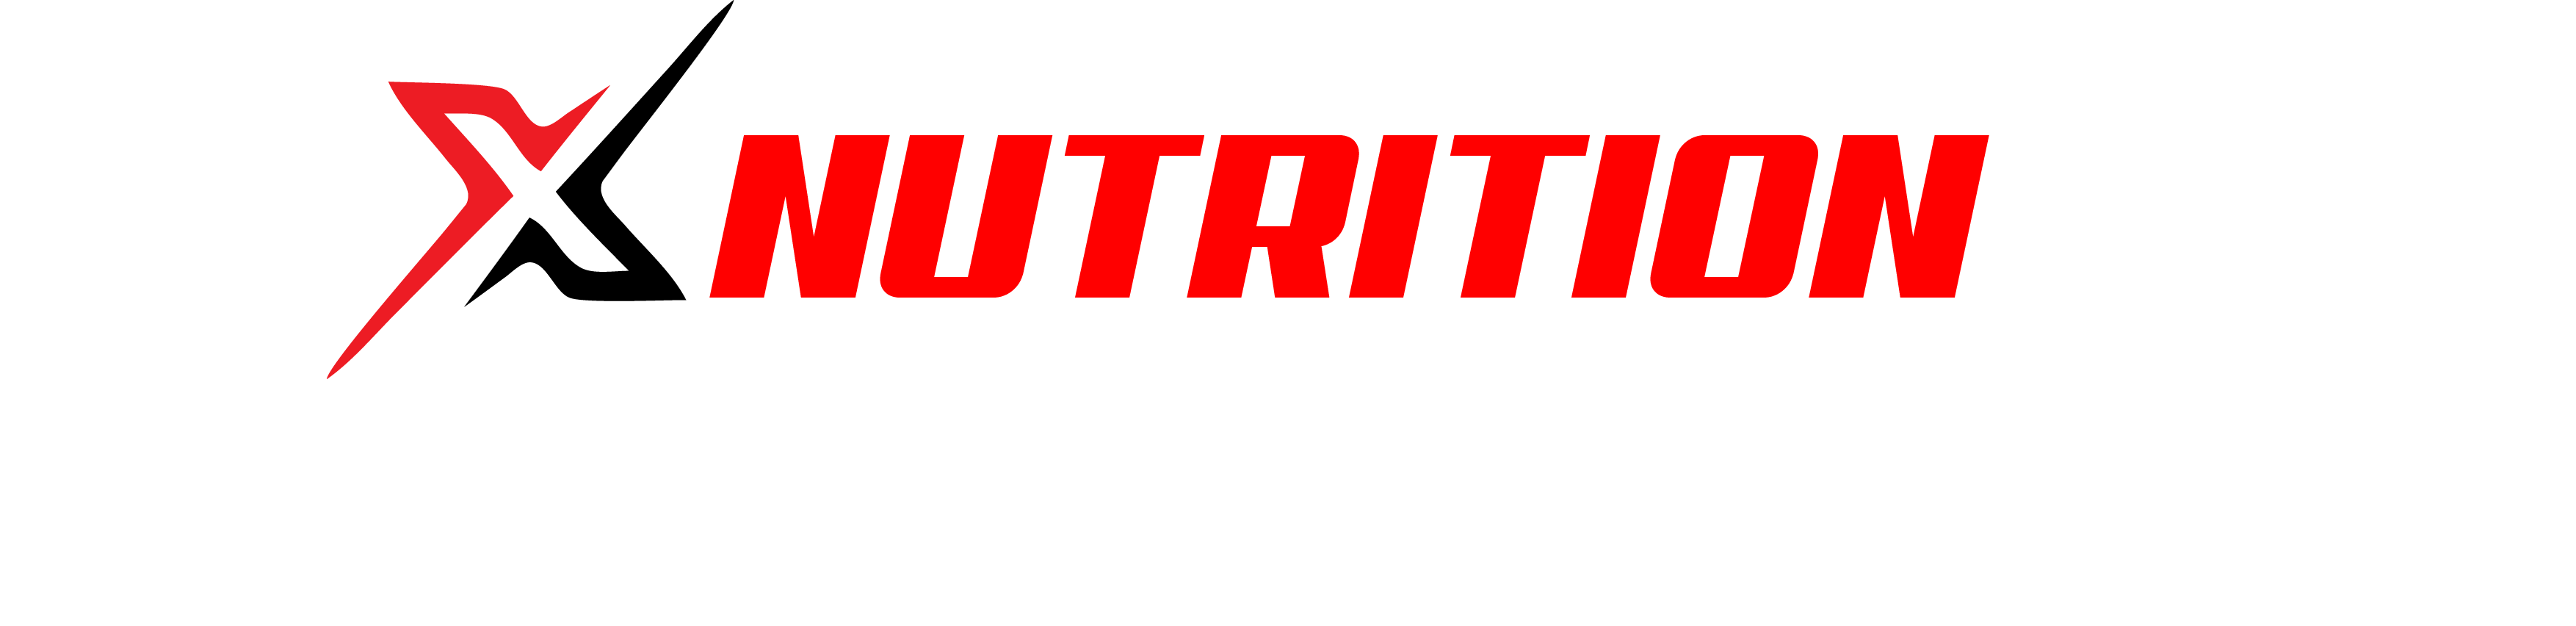 logo_xnutrition-png